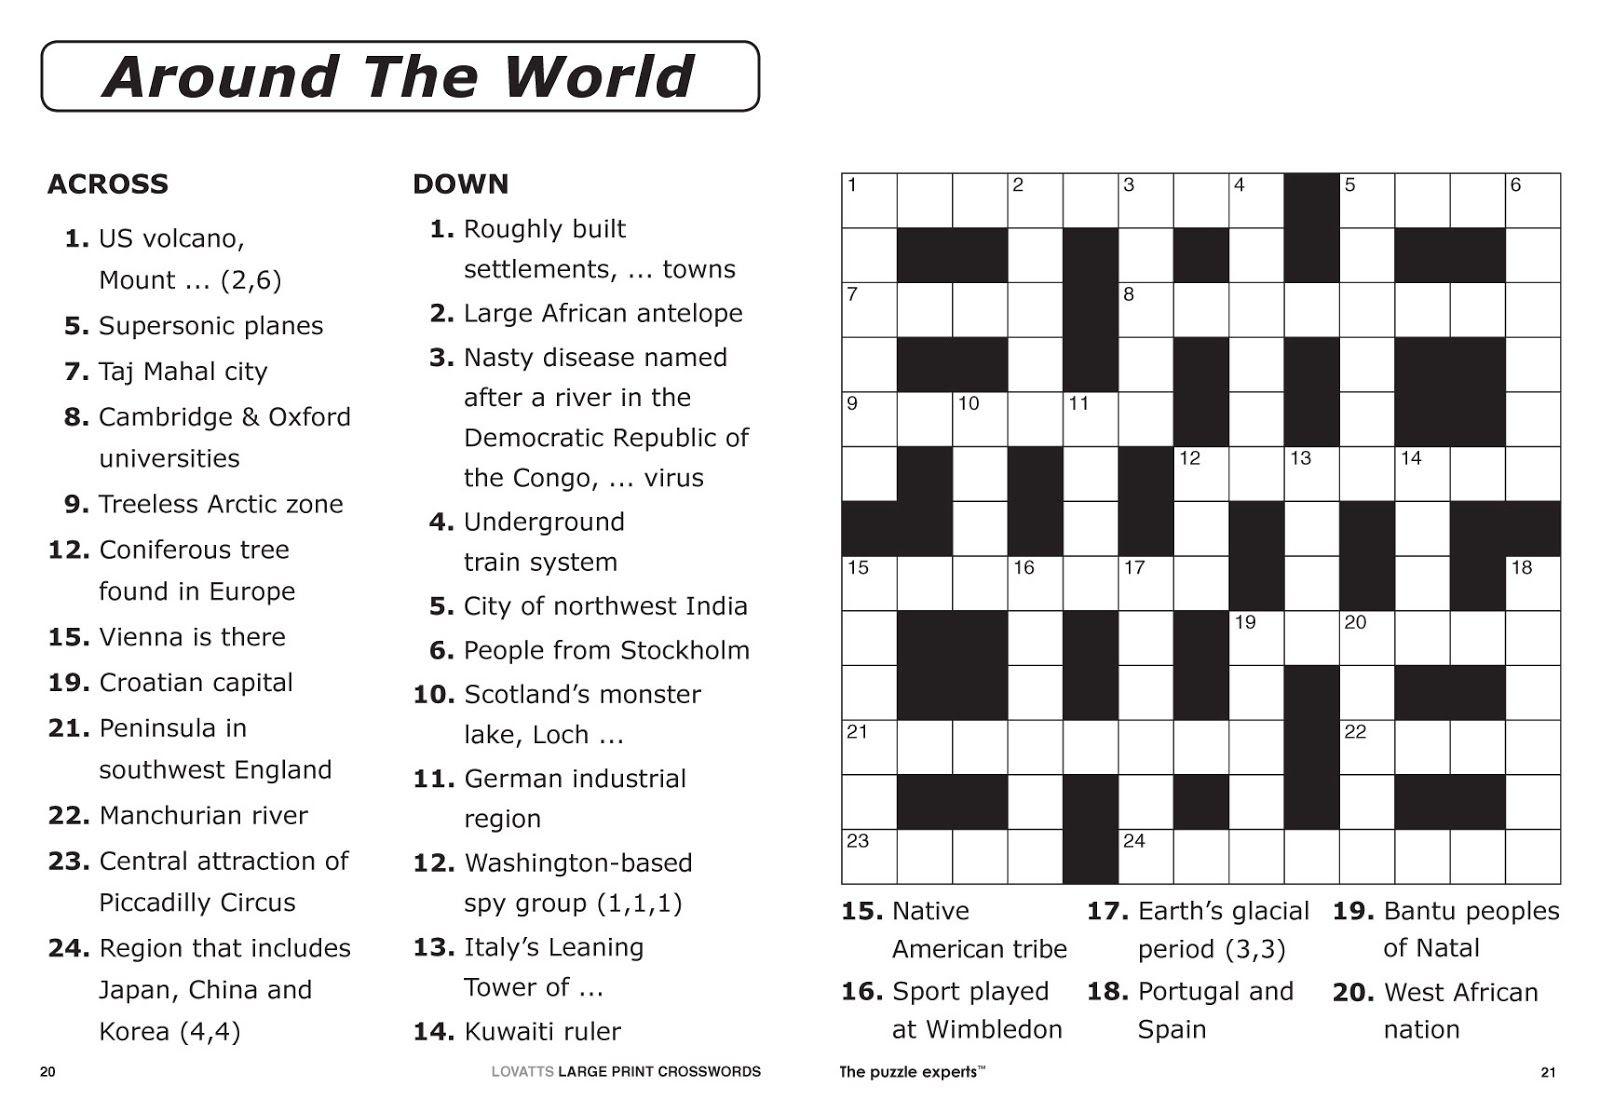 Free Printable Large Print Crossword Puzzles   M3U8 - Printable Crossword Puzzles By Topic